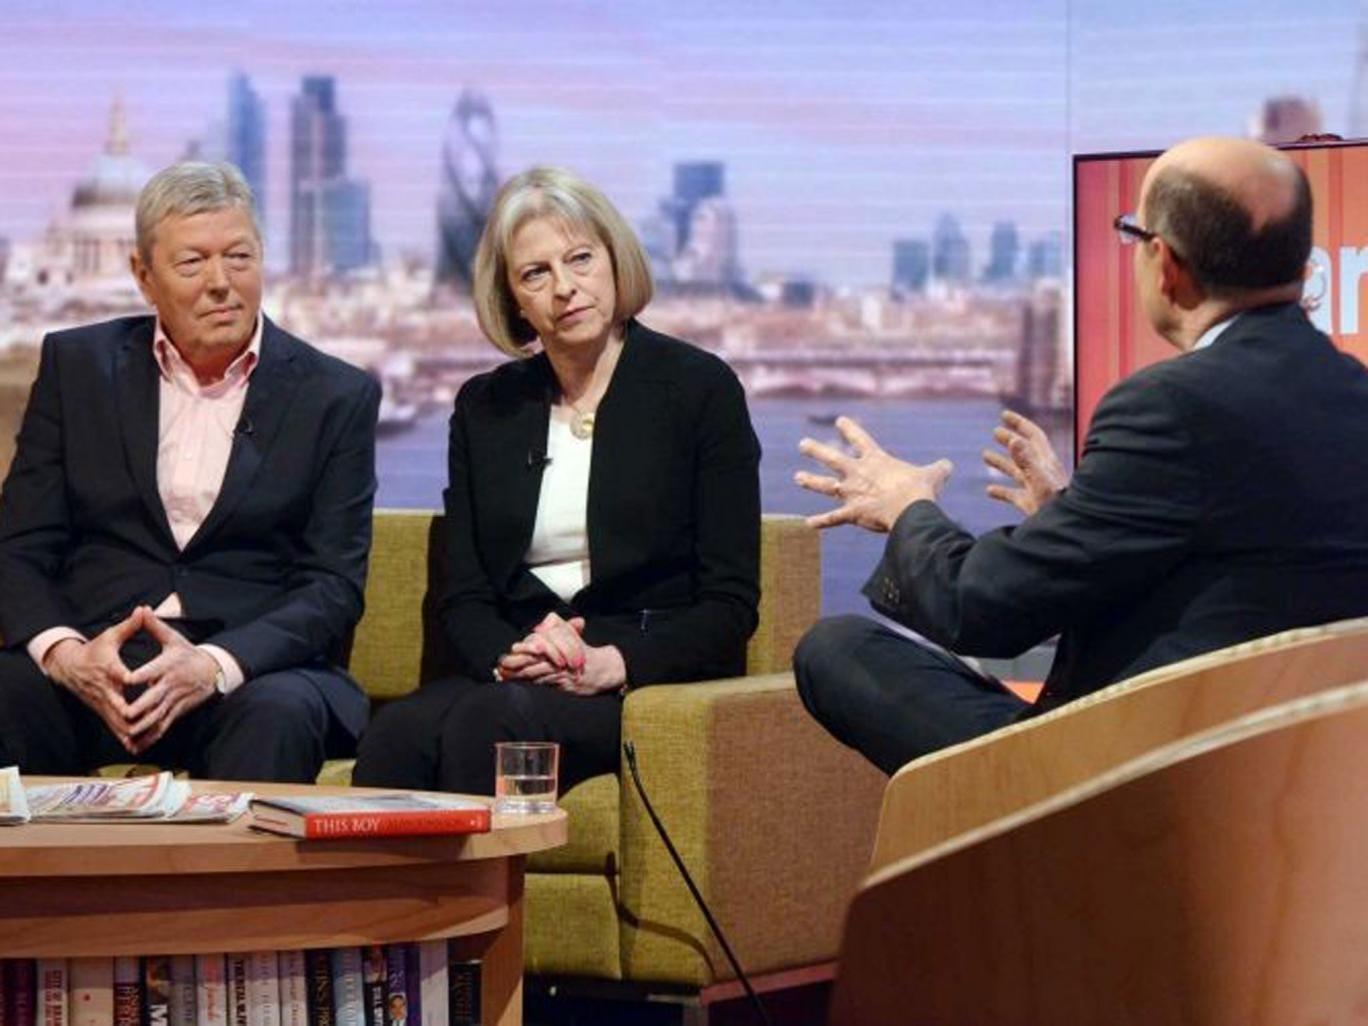 Home Secretary Theresa May and Alan Johnson with host Nick Robinson